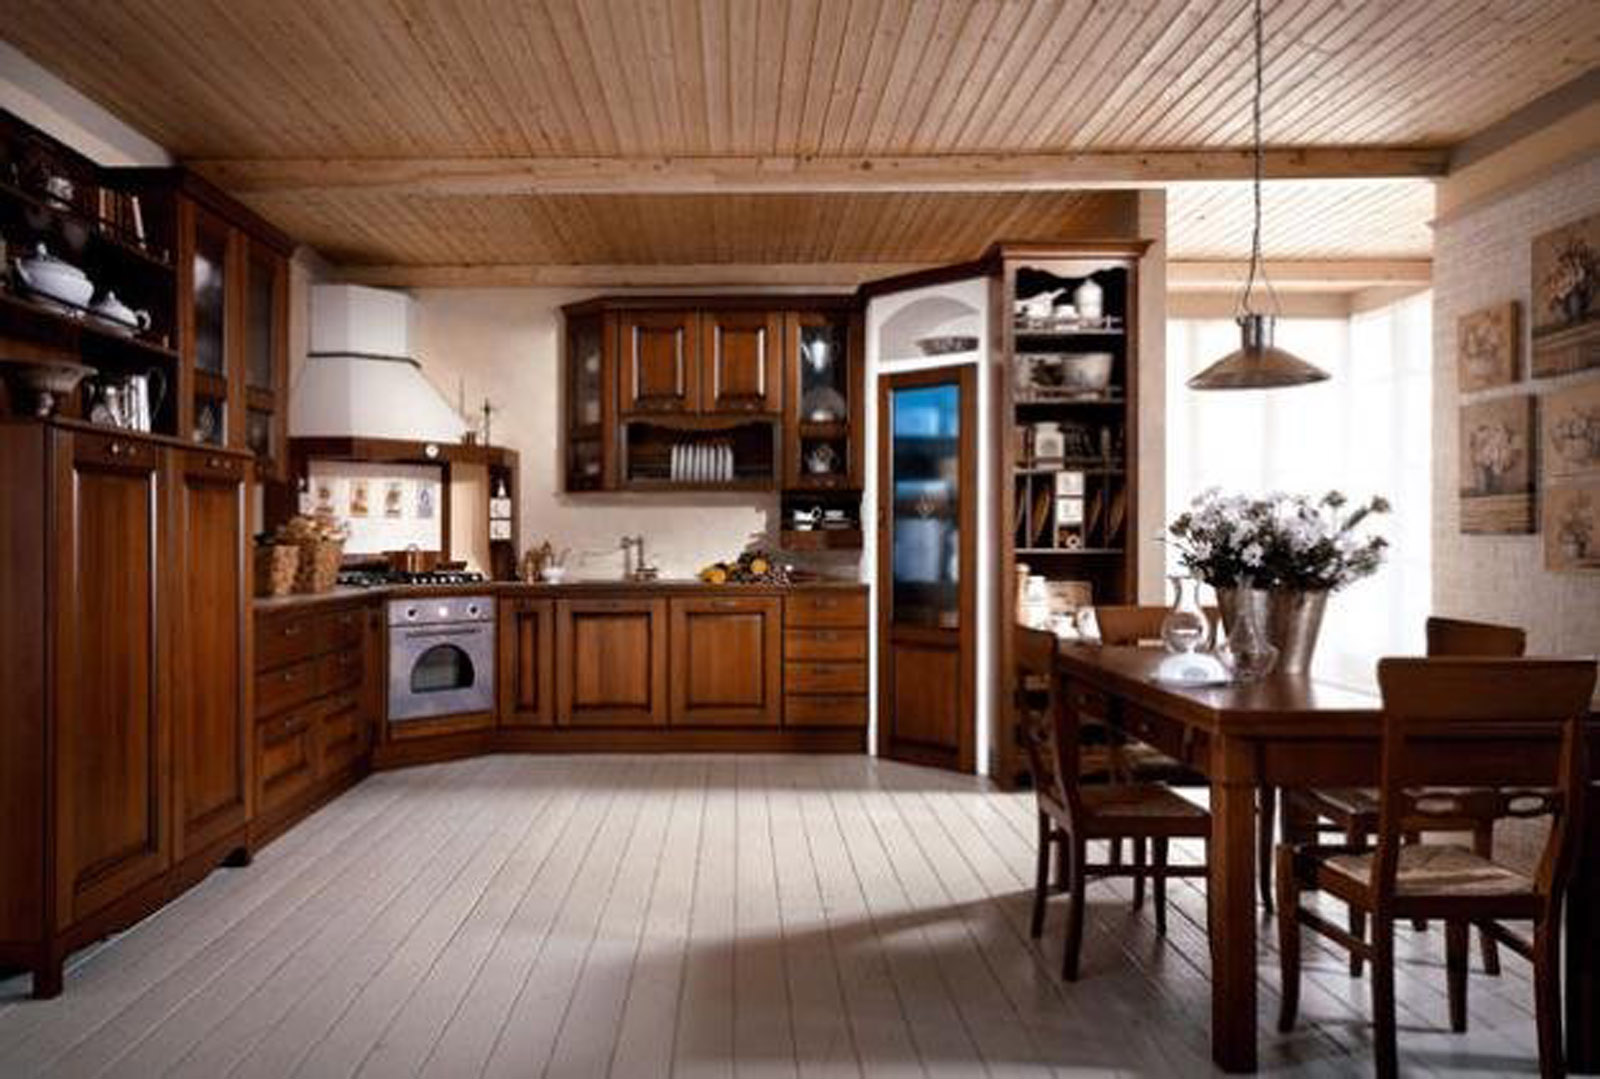 La cucina italiana aran world for Cucina italiana